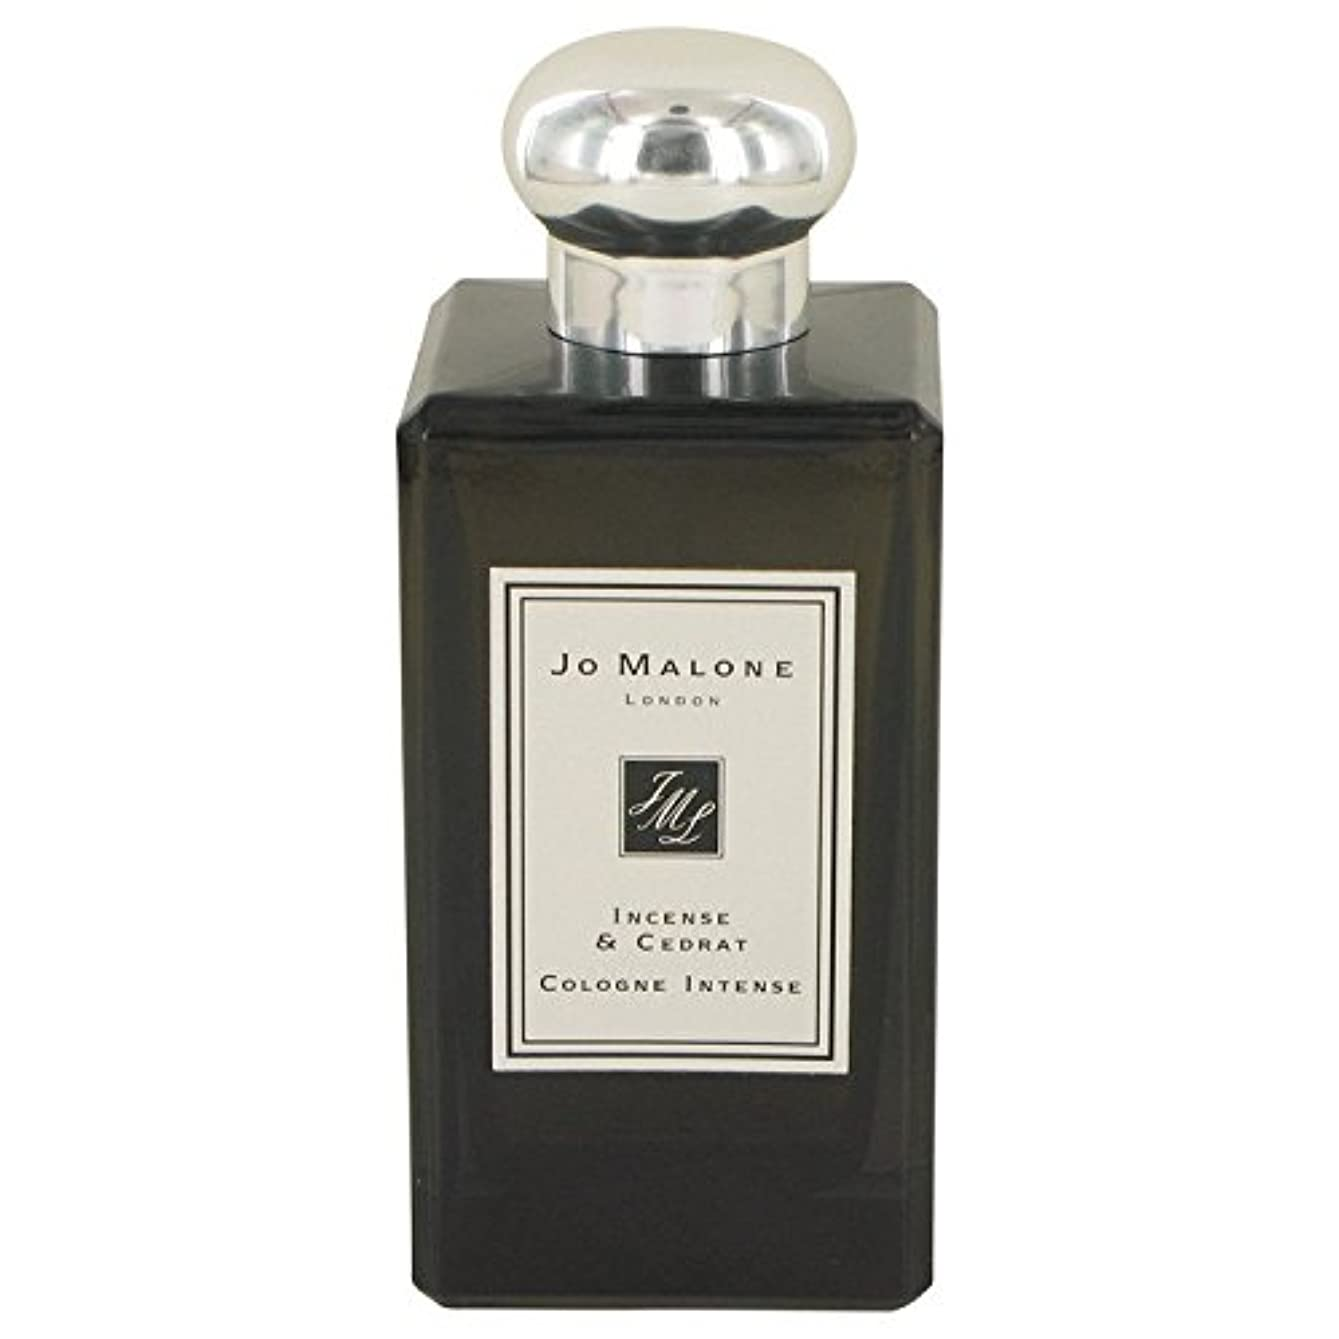 Jo Malone Incense & Cedrat Cologne Intense Spray (Unisex Unboxed) By Jo Malone